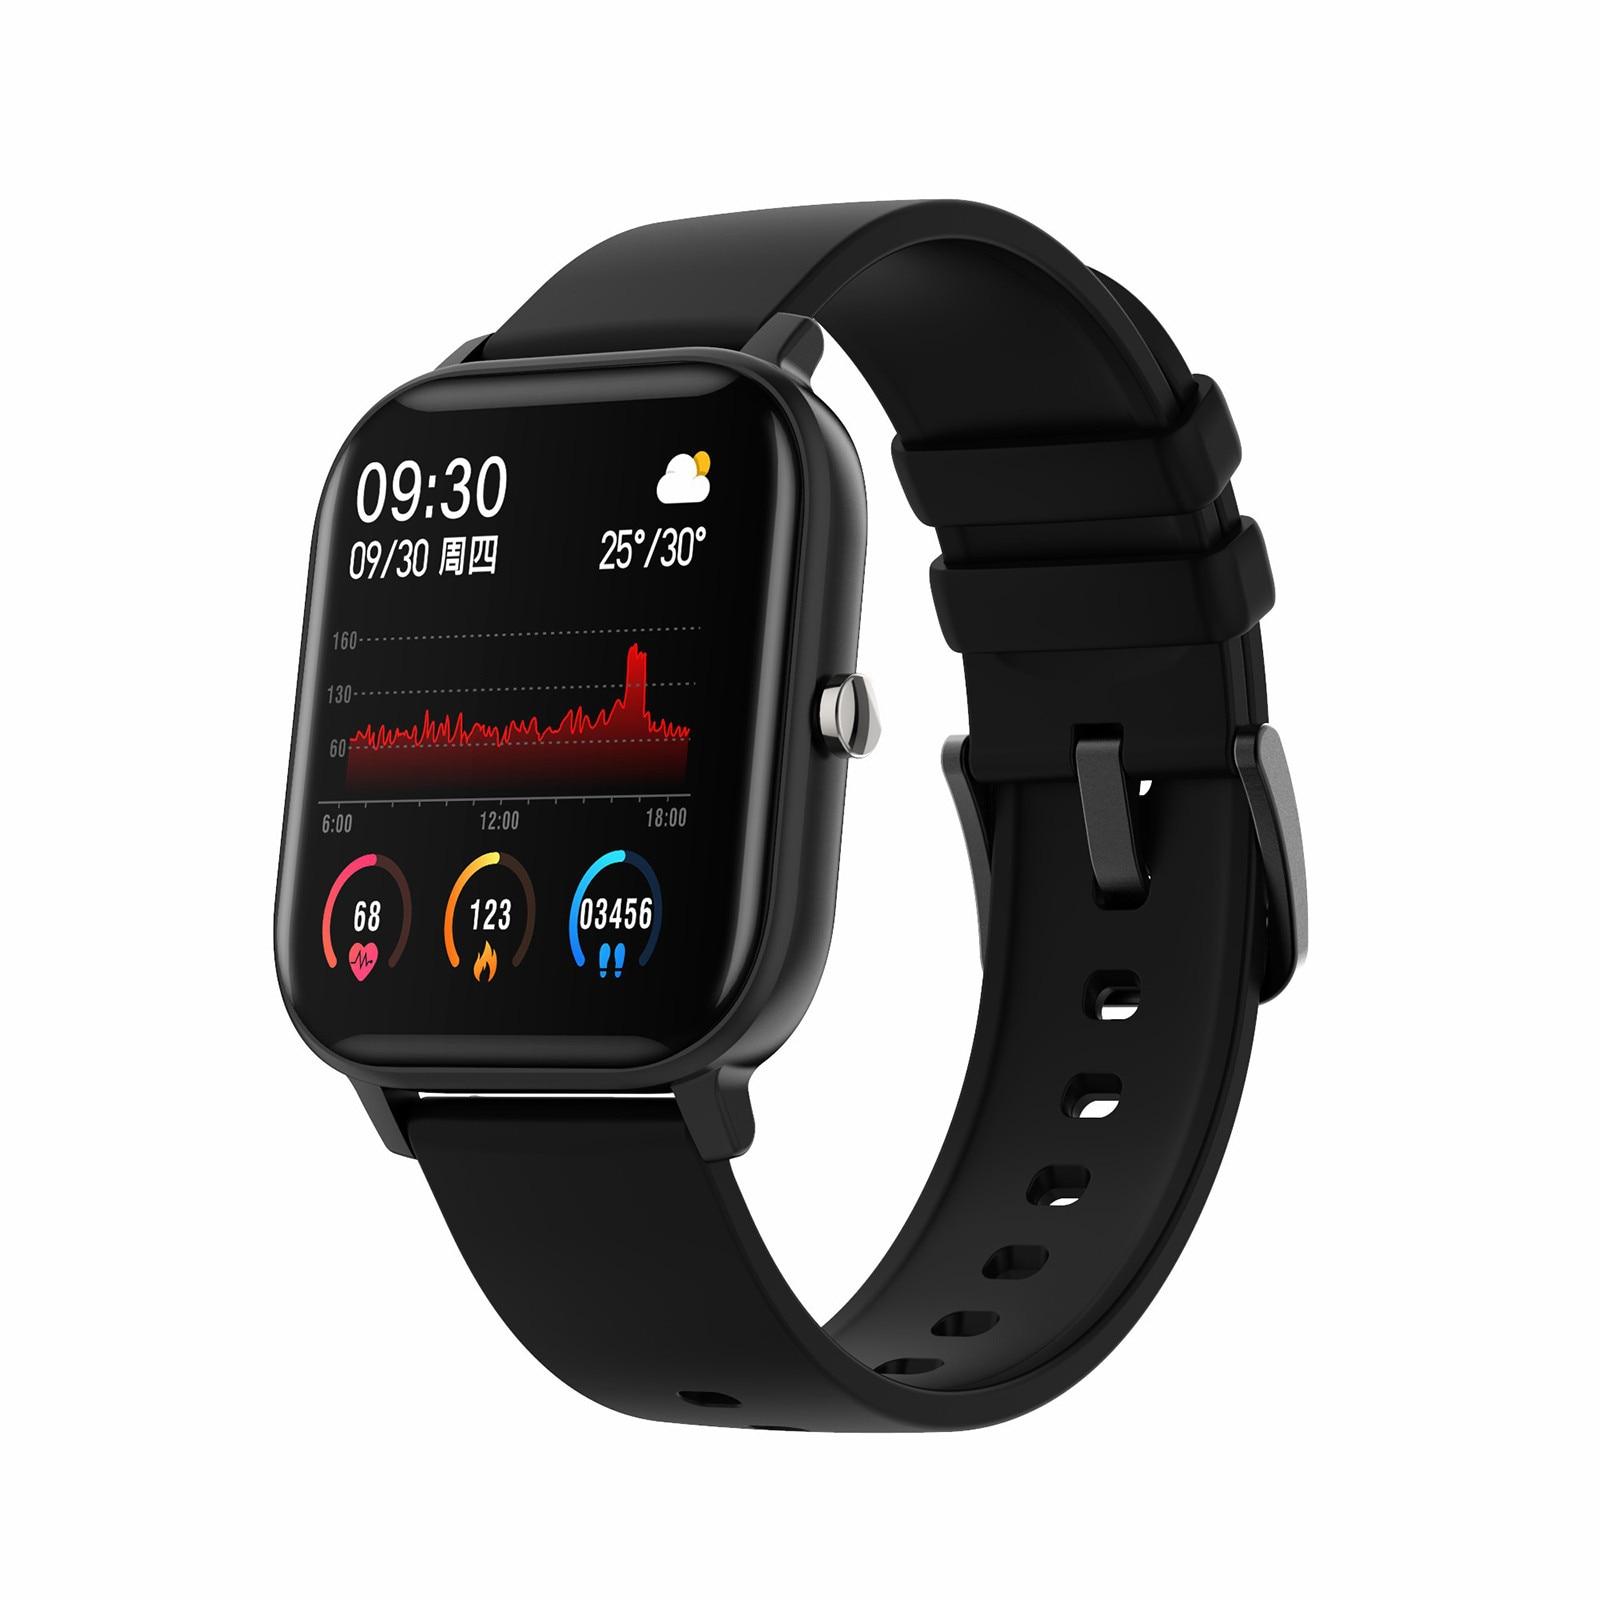 P9 الرياضة ساعة ذكية معدنية حالة الرجال امرأة كاملة Smartwatch IP67 مقاوم للماء رصد معدل ضربات القلب النوم للهاتف iOS أندرويد